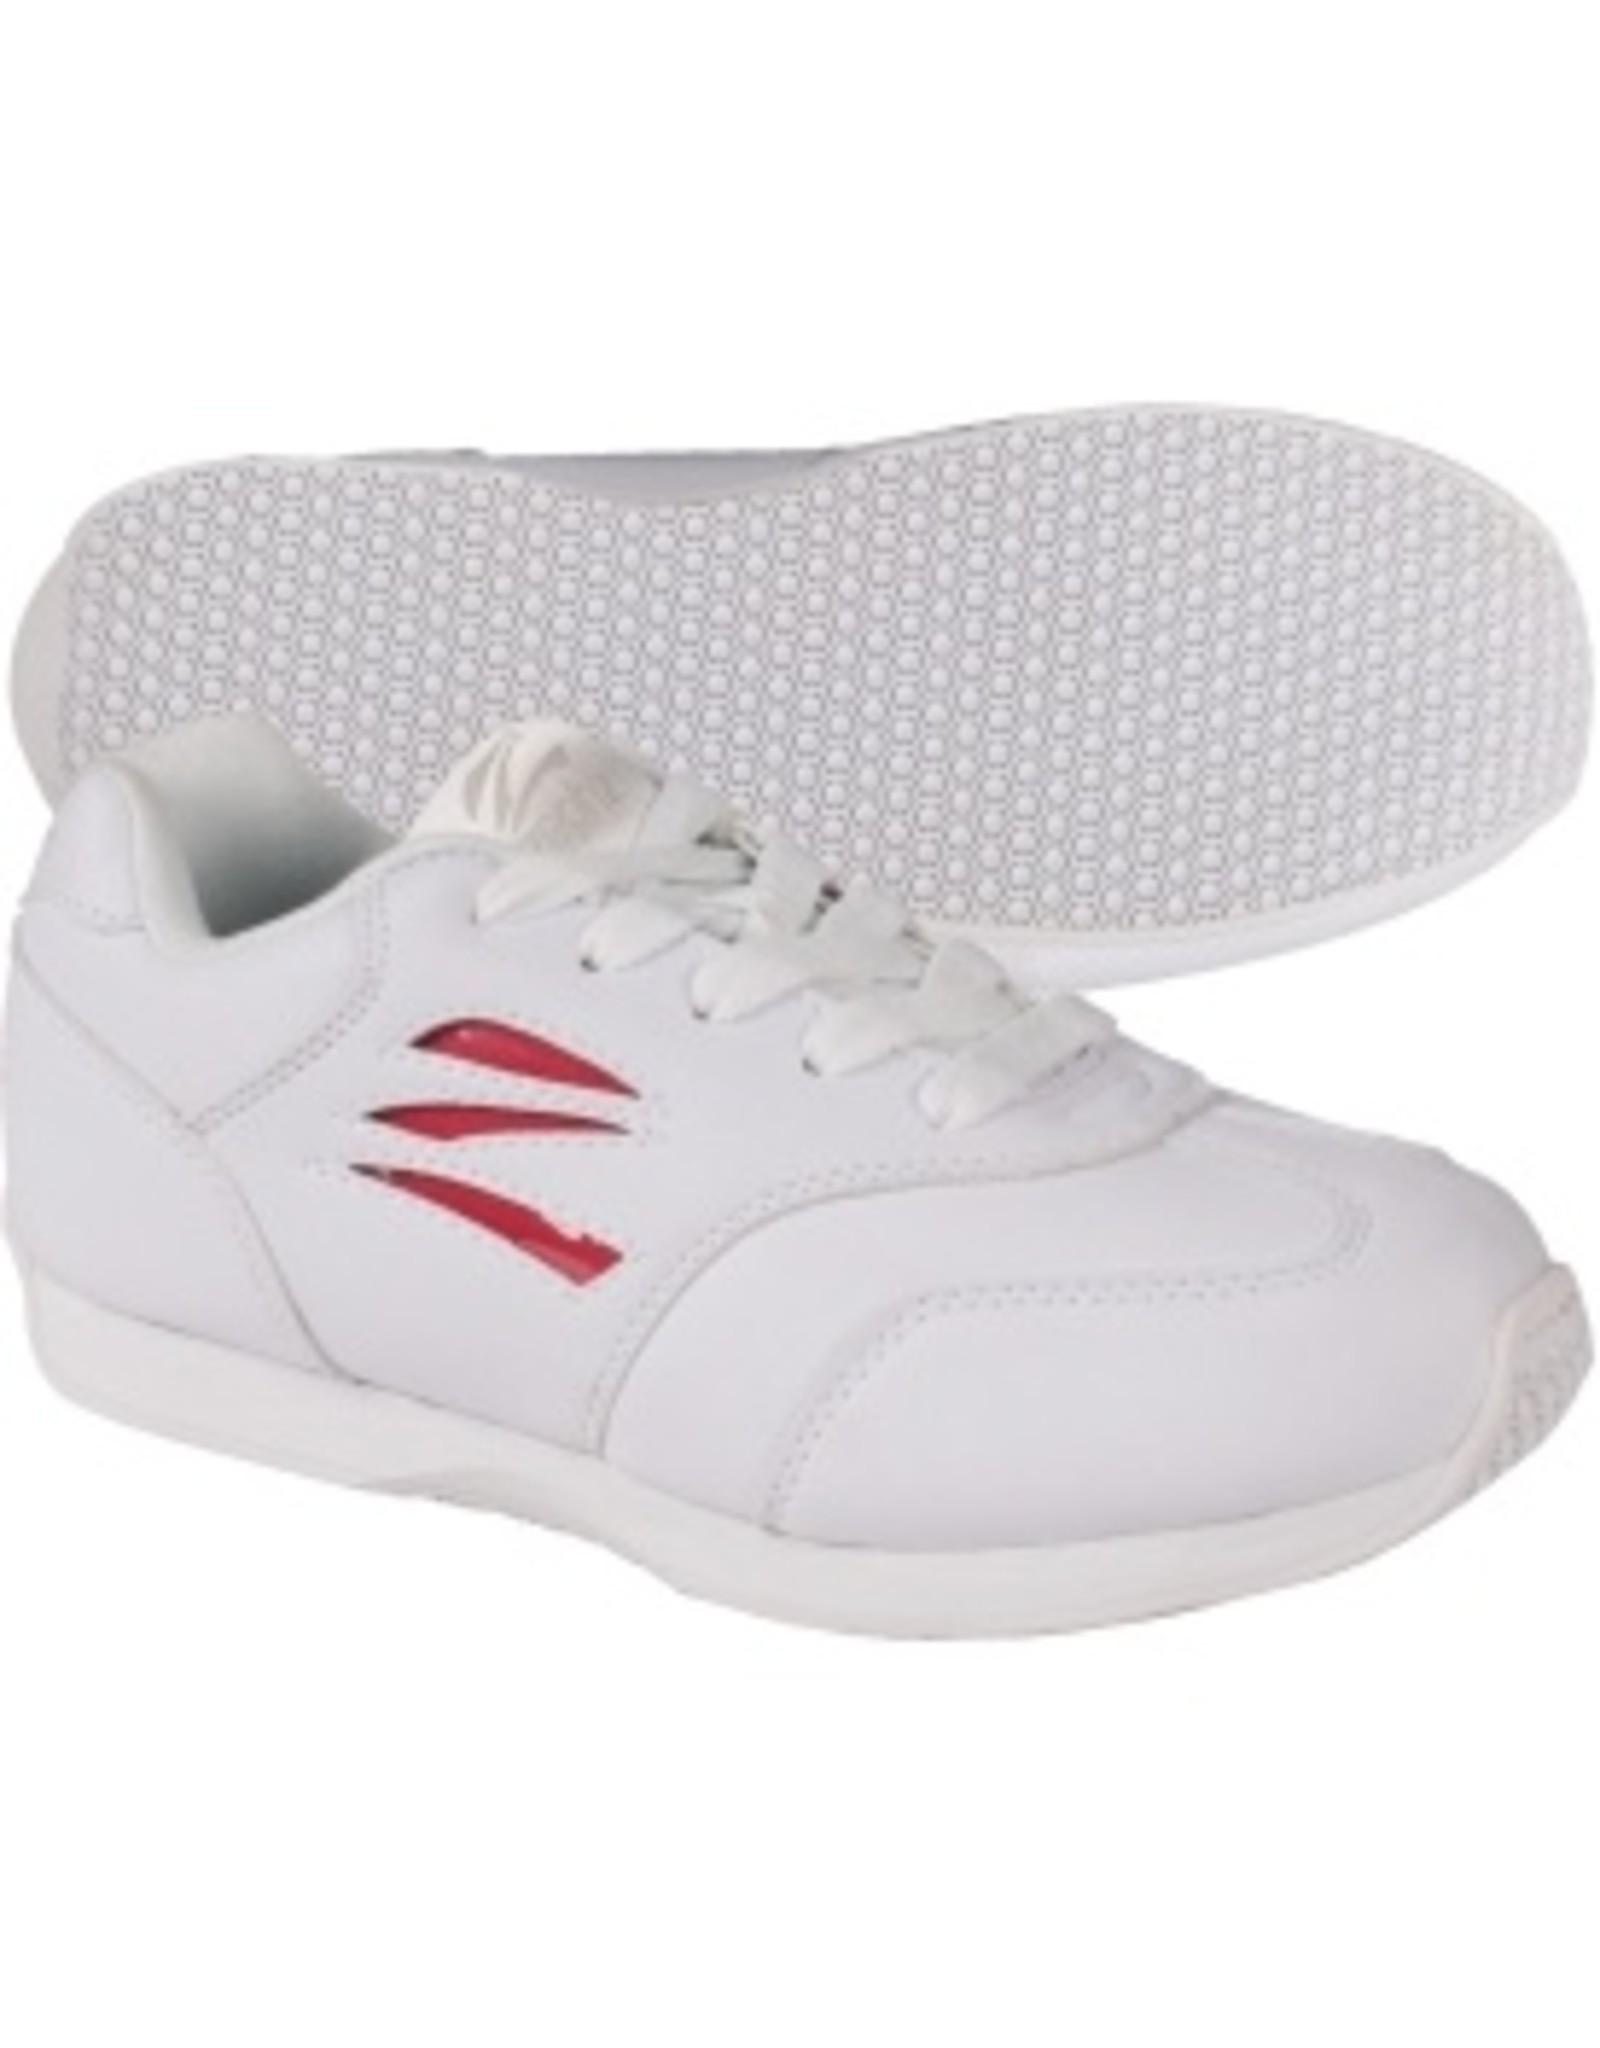 Zephz Butterfly Zephz Youth Cheer Shoe